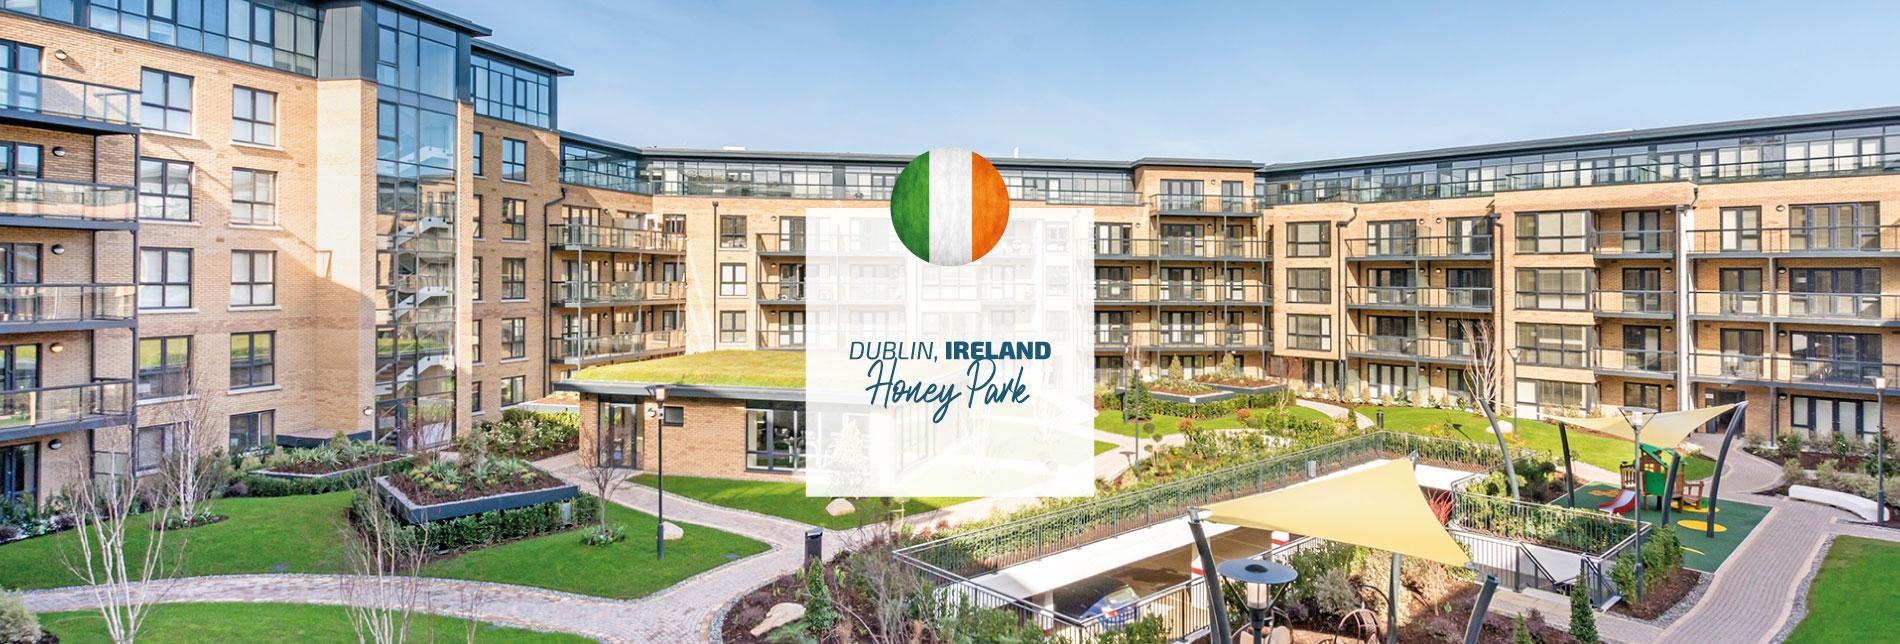 EUROPE / Honey Park, Dublin, Ireland